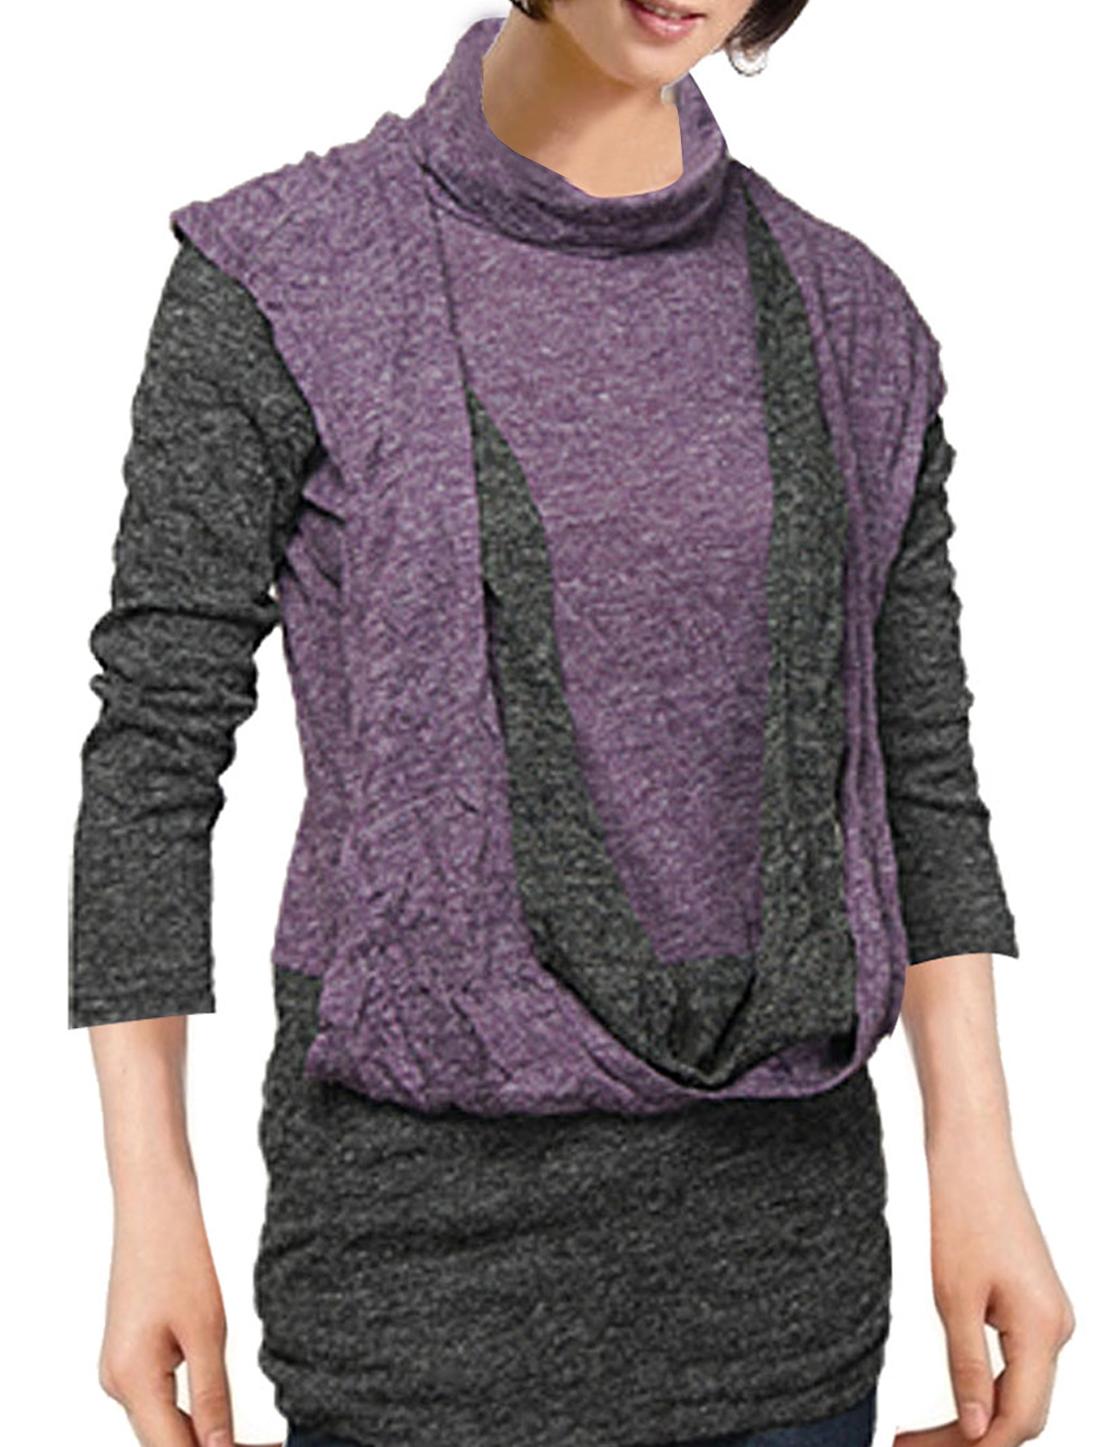 Lady 3/4 Sleeve Turtleneck Faux 2 Piece Purple Dark Gray Shirt XS